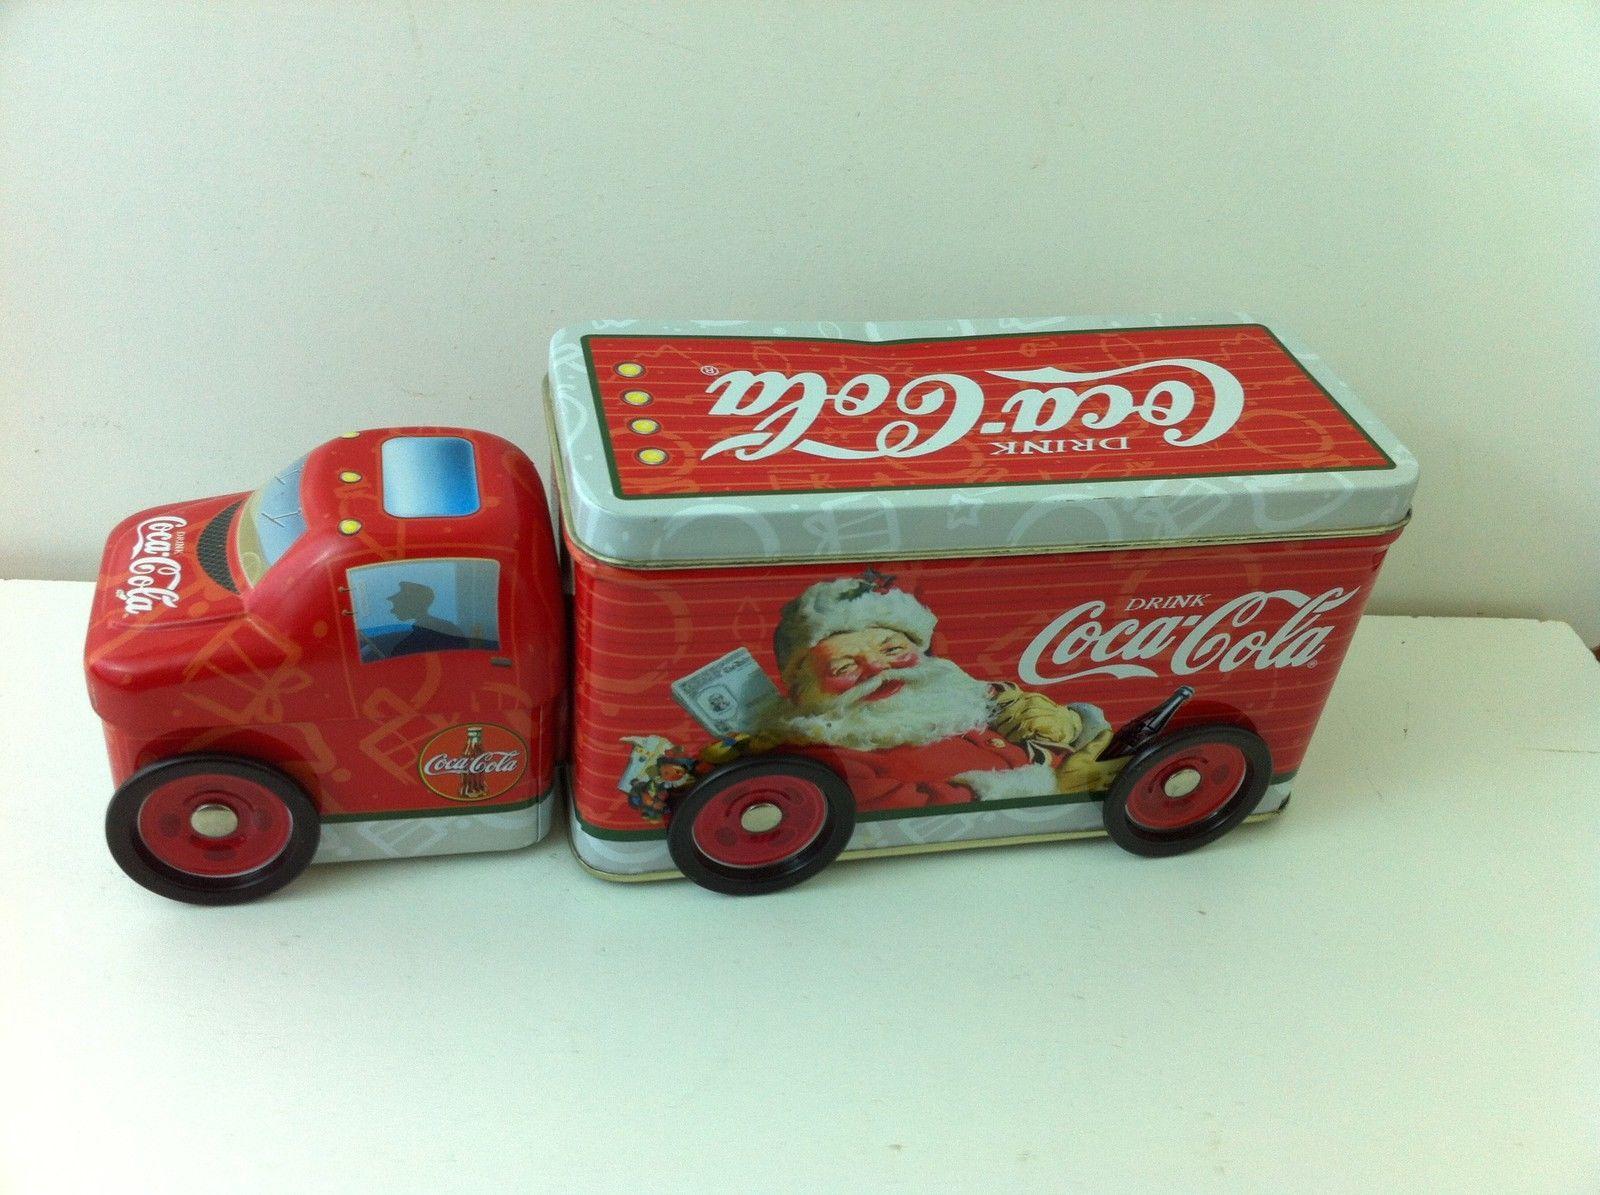 2003 Coke Coca Cola Tin Christmas Santa Claus Semi Truck Toy with Wheels Mint   eBay